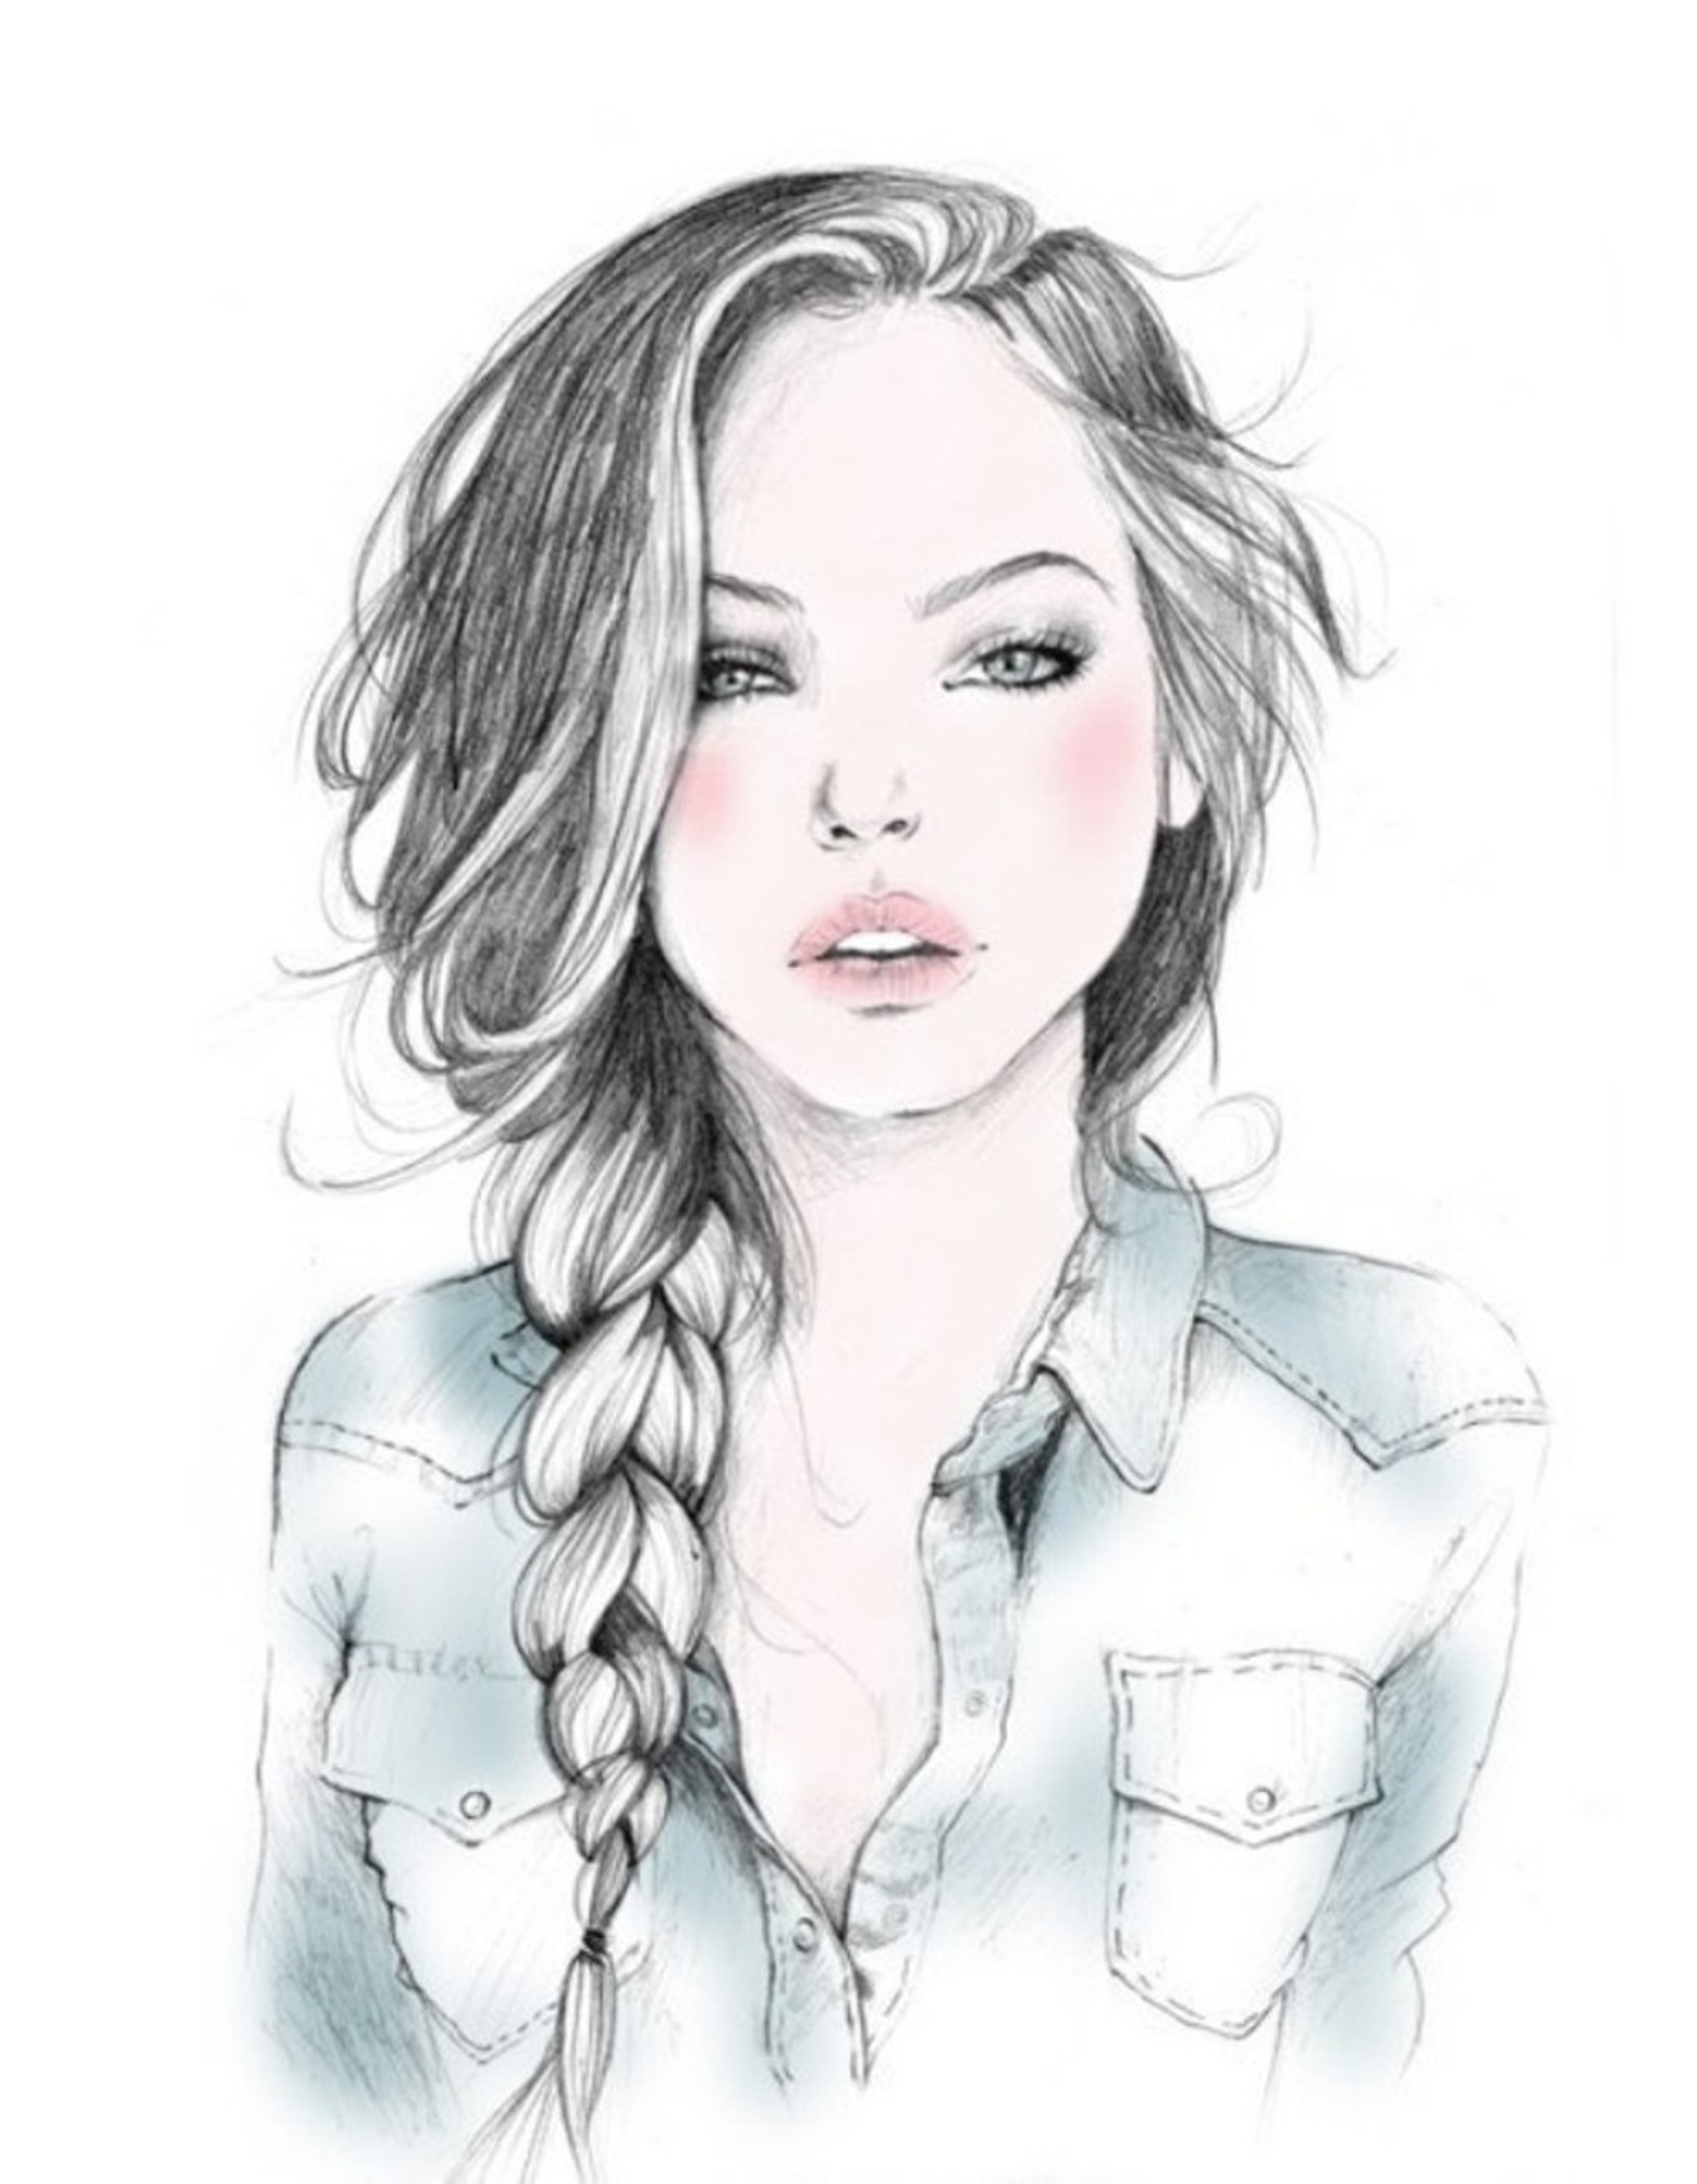 Drawn portrait cute Love I Cute More Drawings